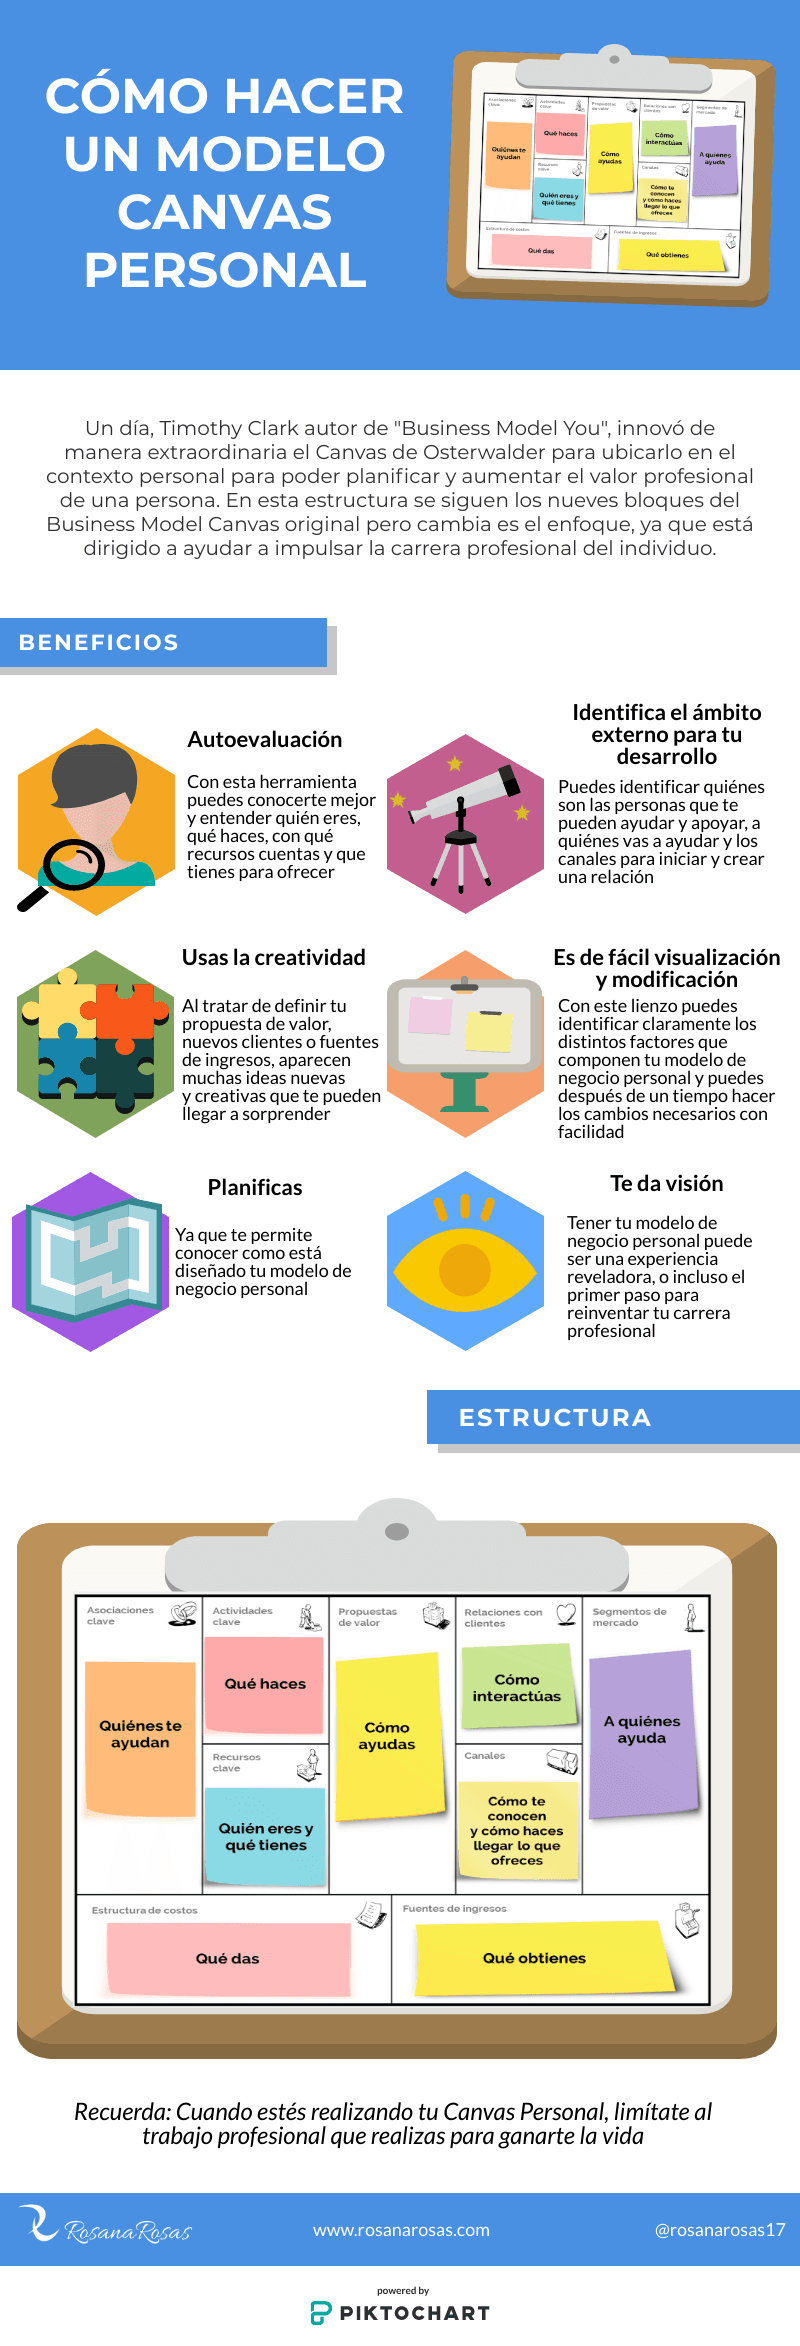 infografia modelo canvas personal